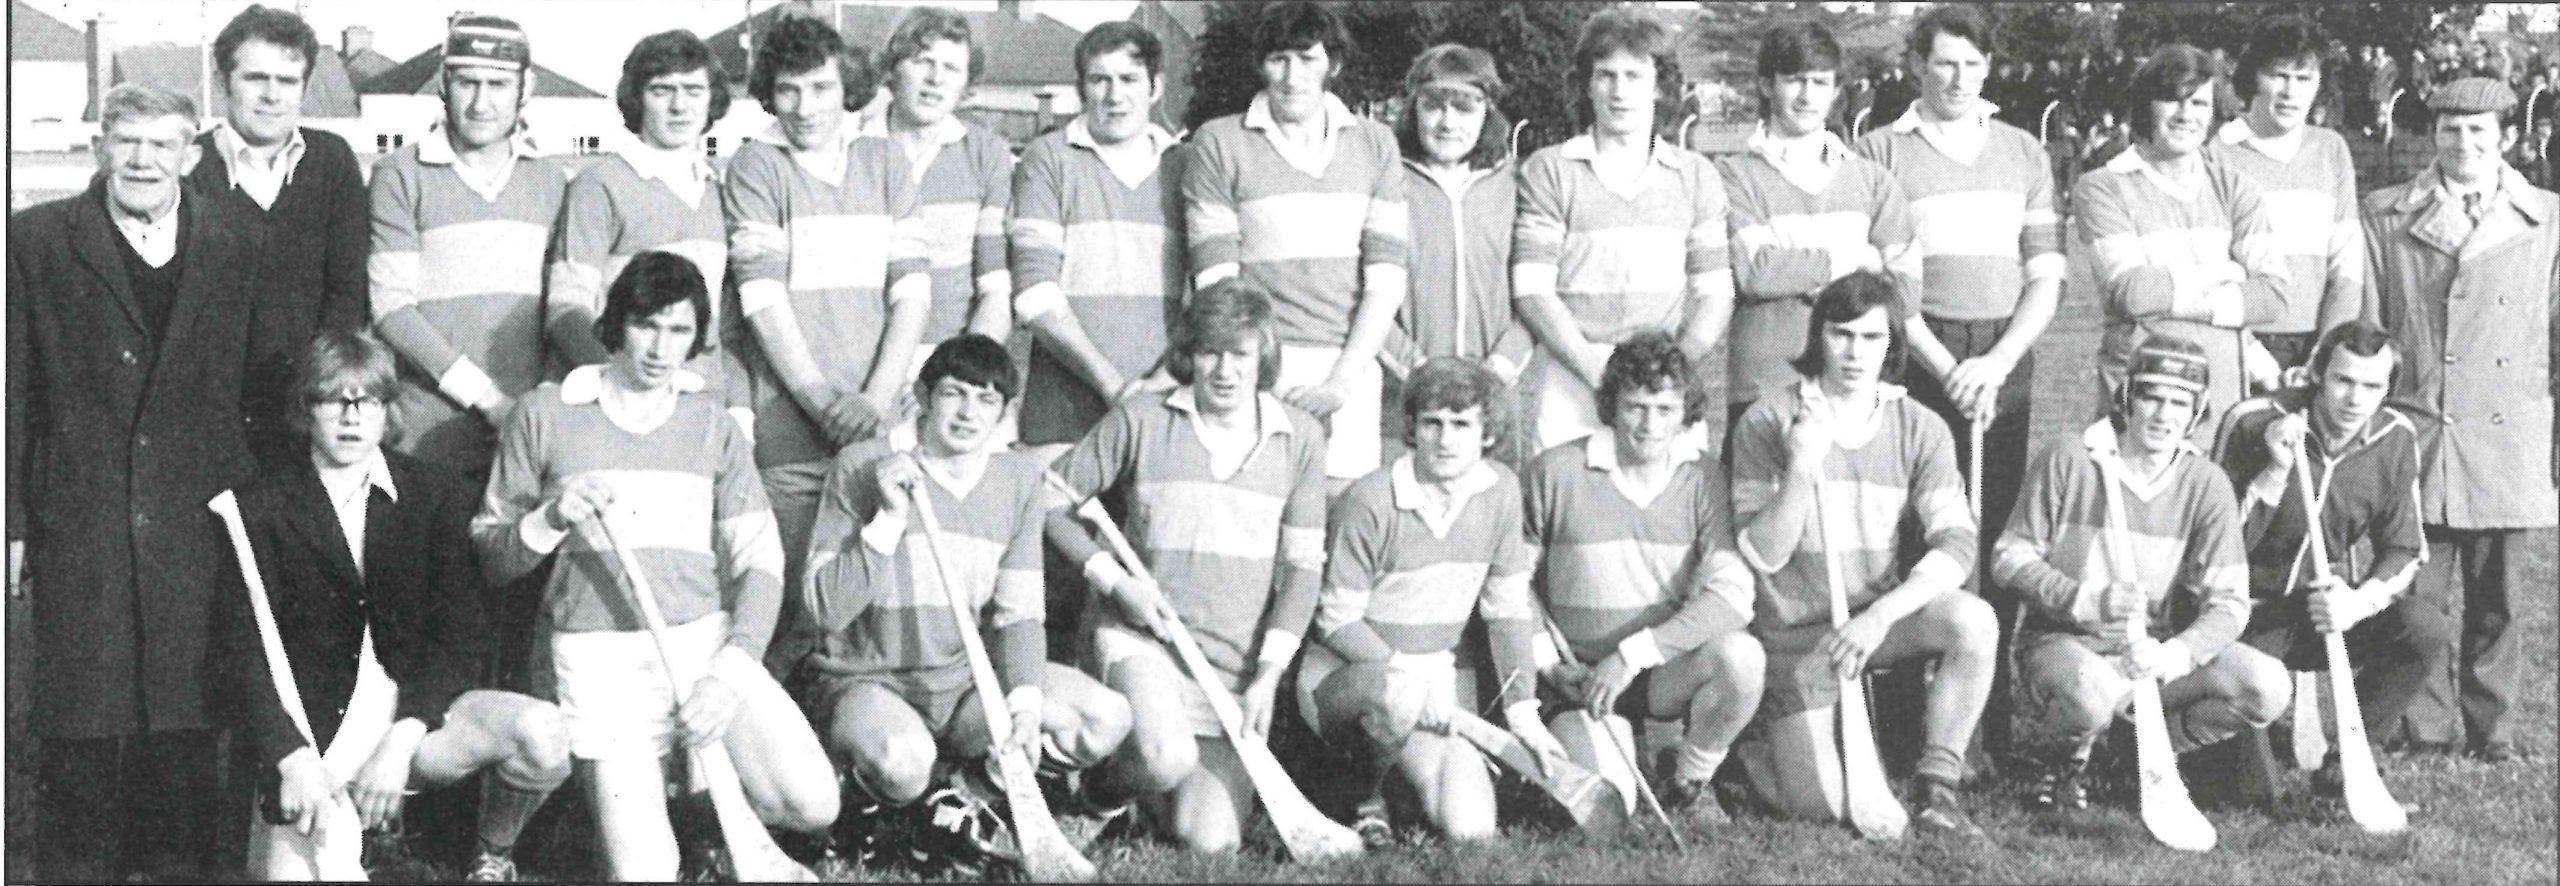 http://blackwater.gaa.ie/wp-content/uploads/2020/01/1975-Junior-hurling-final-team-scaled.jpg